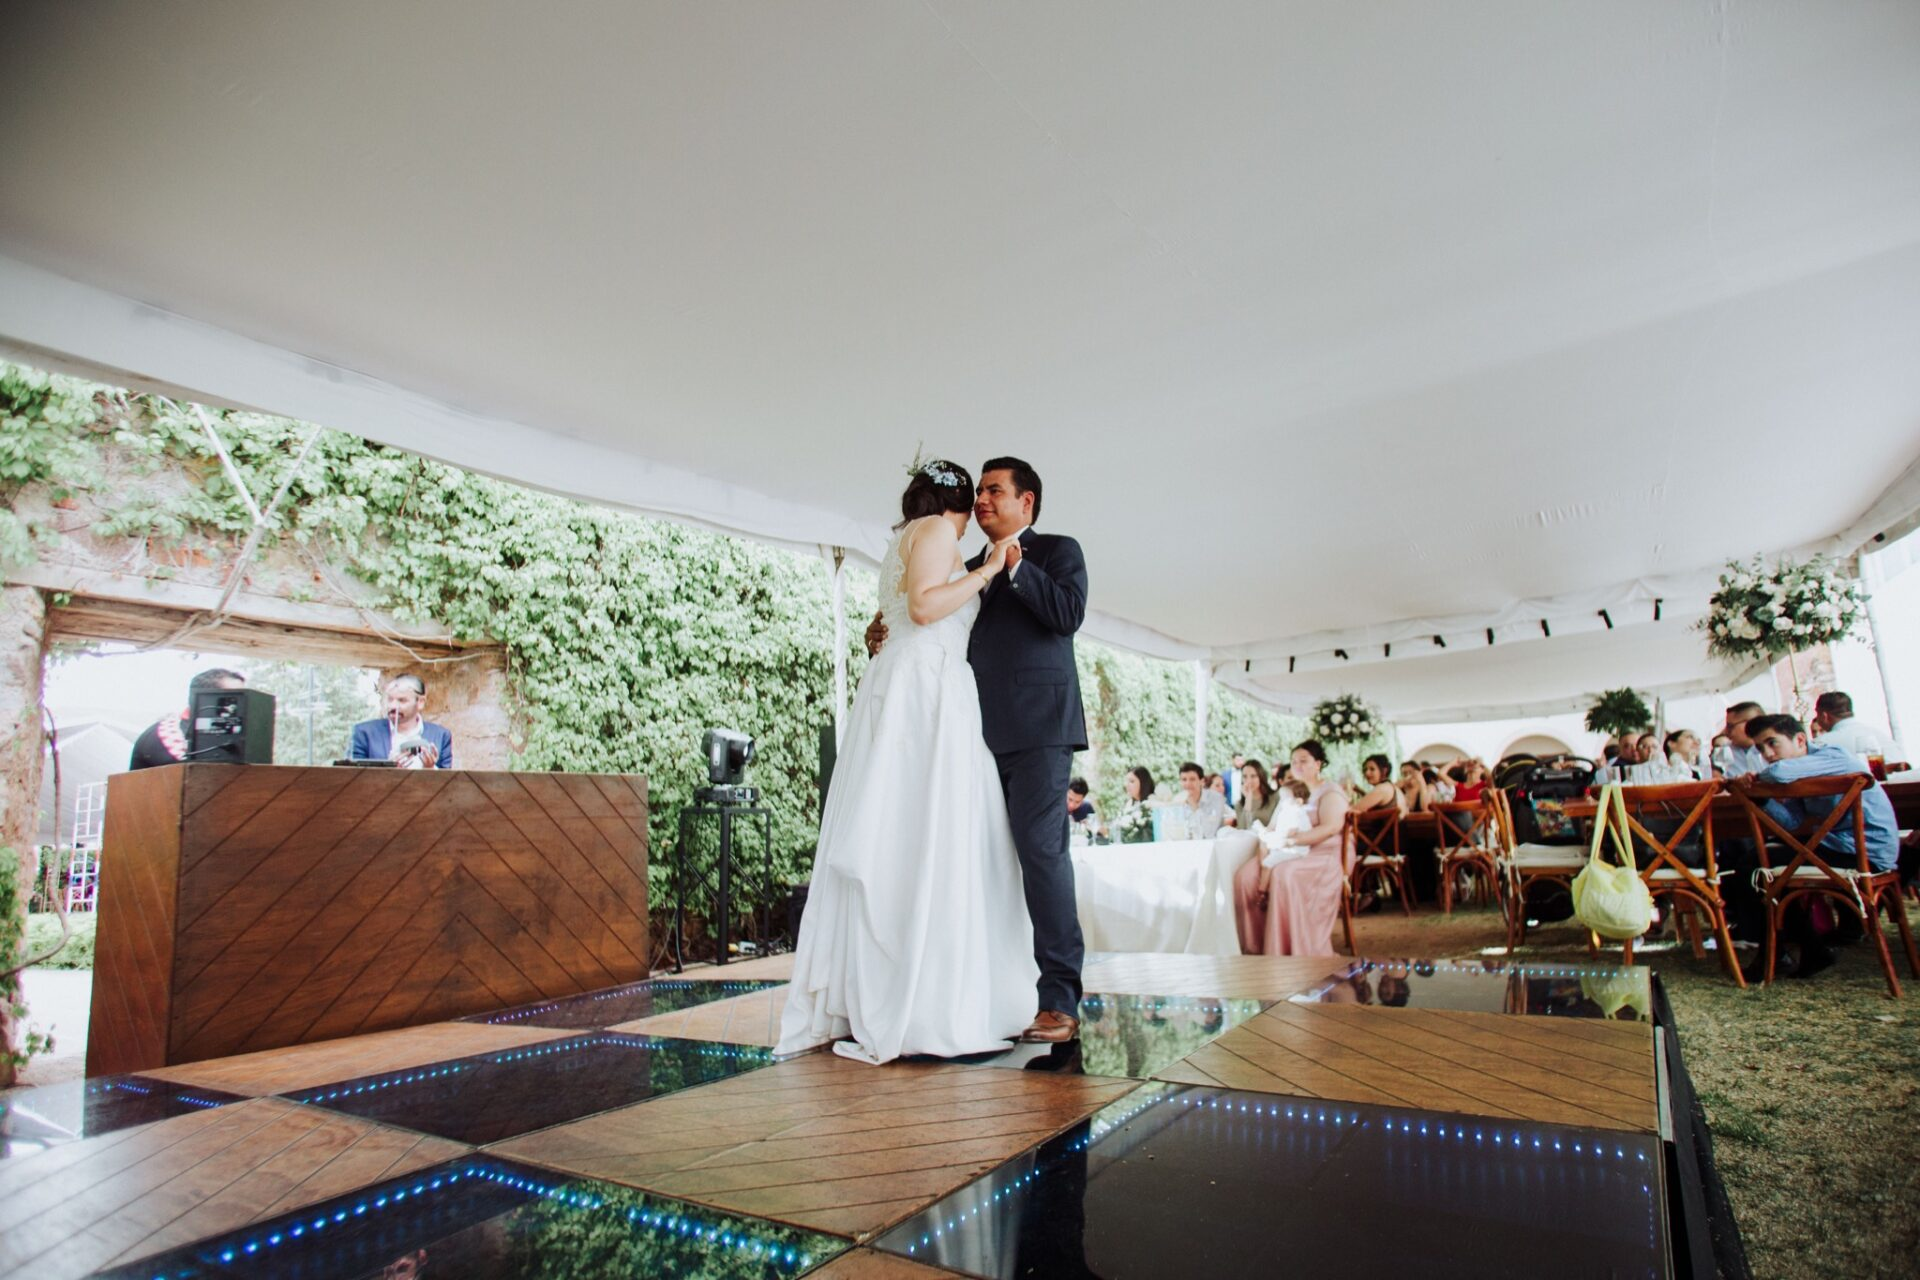 javier_noriega_fotografo_bodas_centro_platero_zacatecas_wedding_photographer33